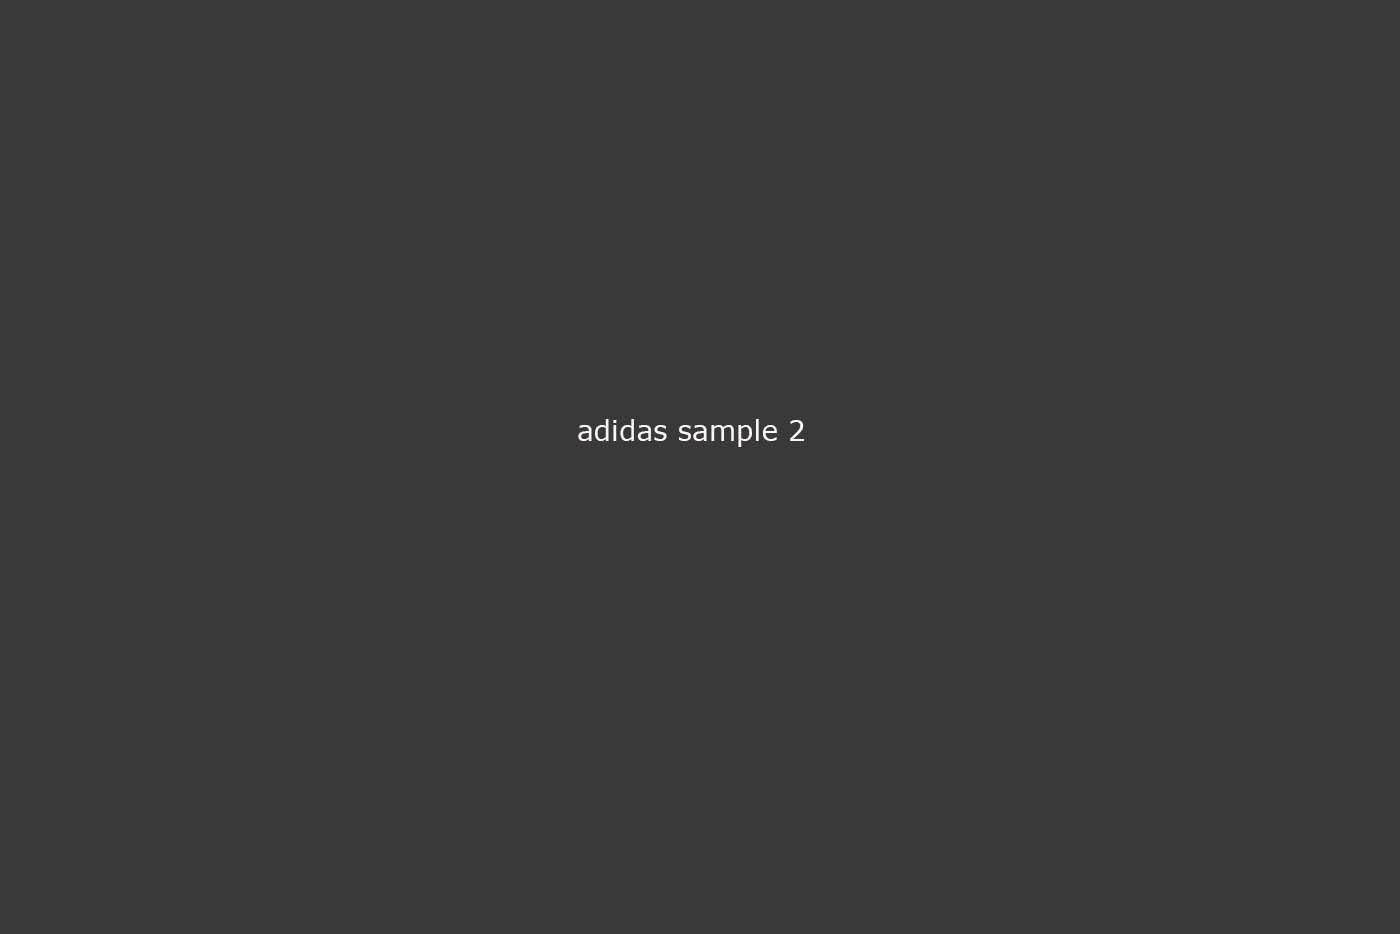 adidas-sample-2